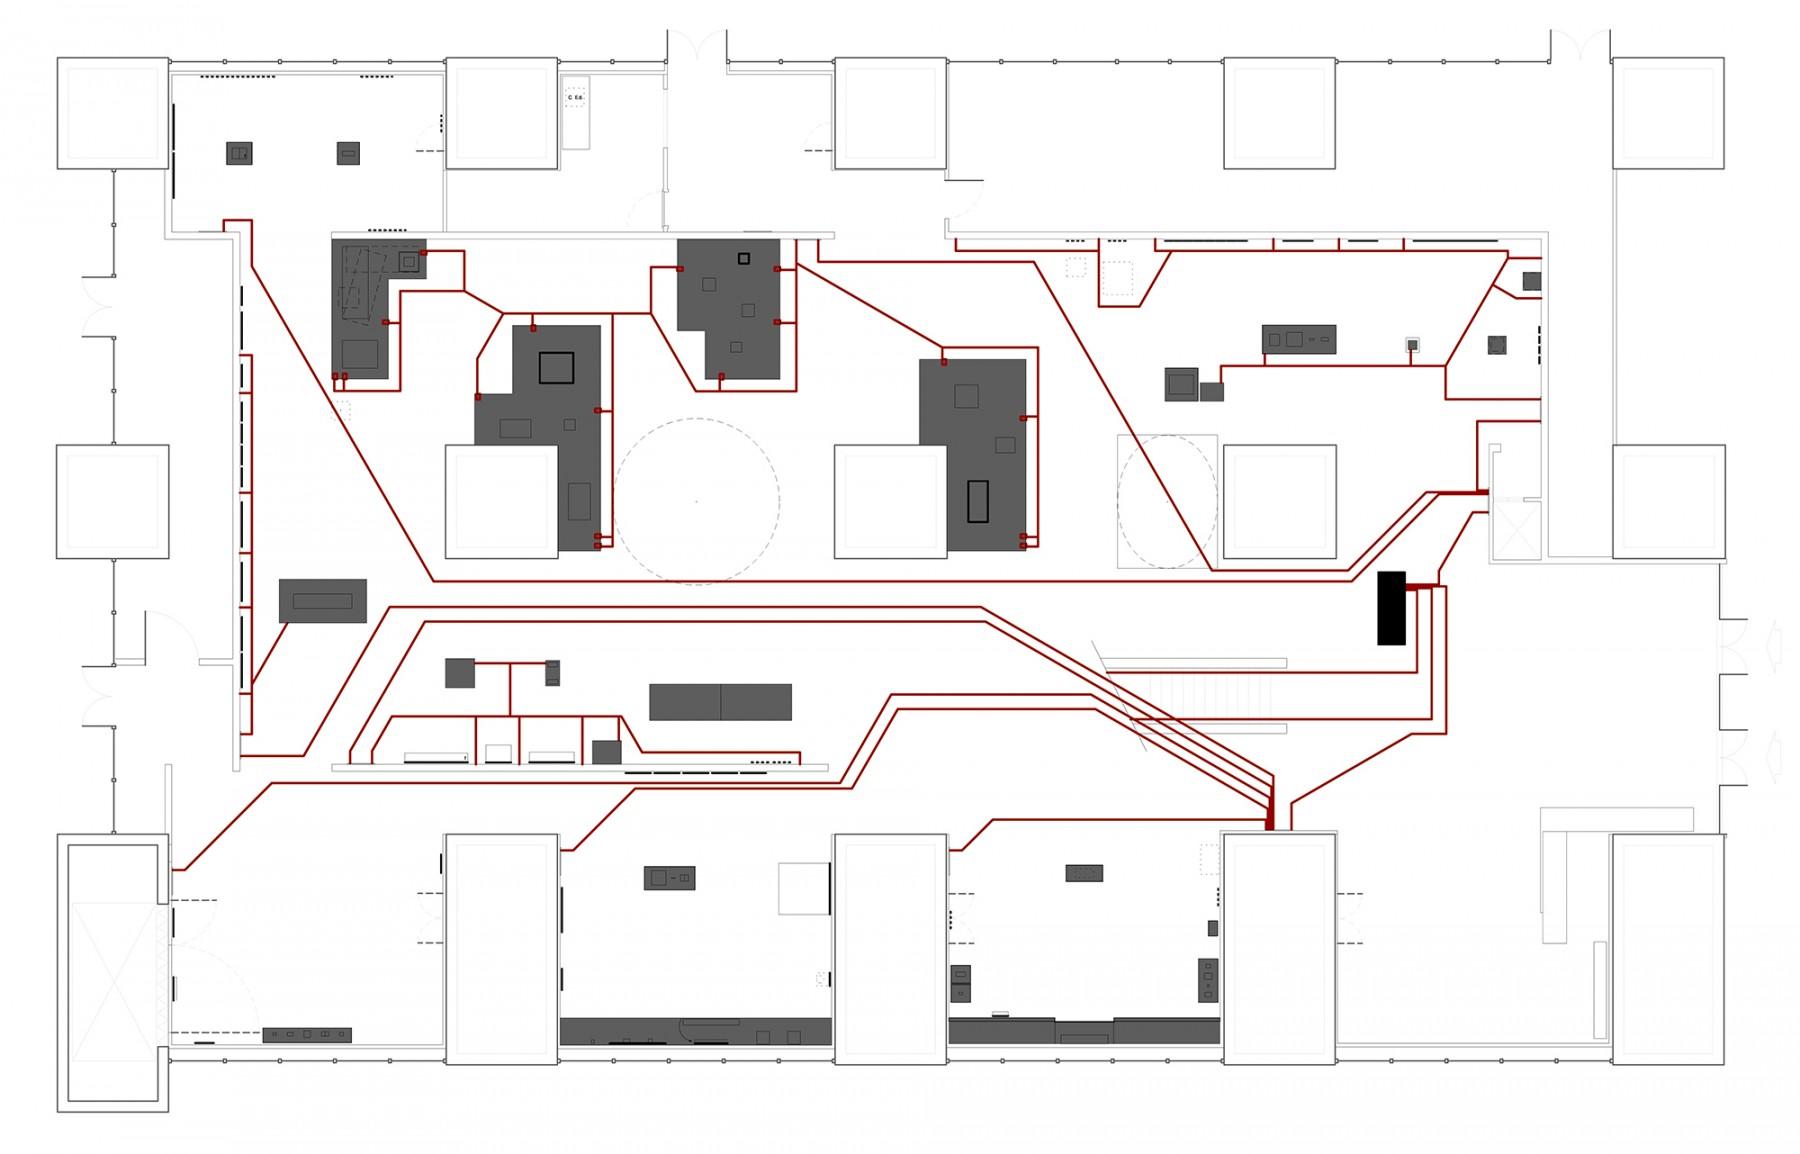 Martian-Museum-Terrestrial-art-Barbican-London-contemporary-design-exhibition-gallery-Jamie-Fobert-Architects-plan